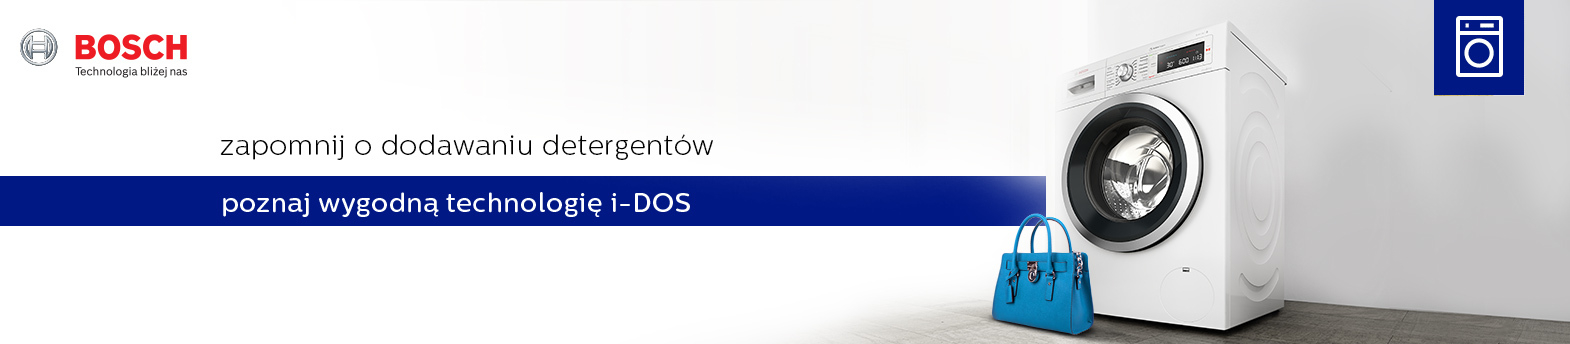 Bosch i-Dos